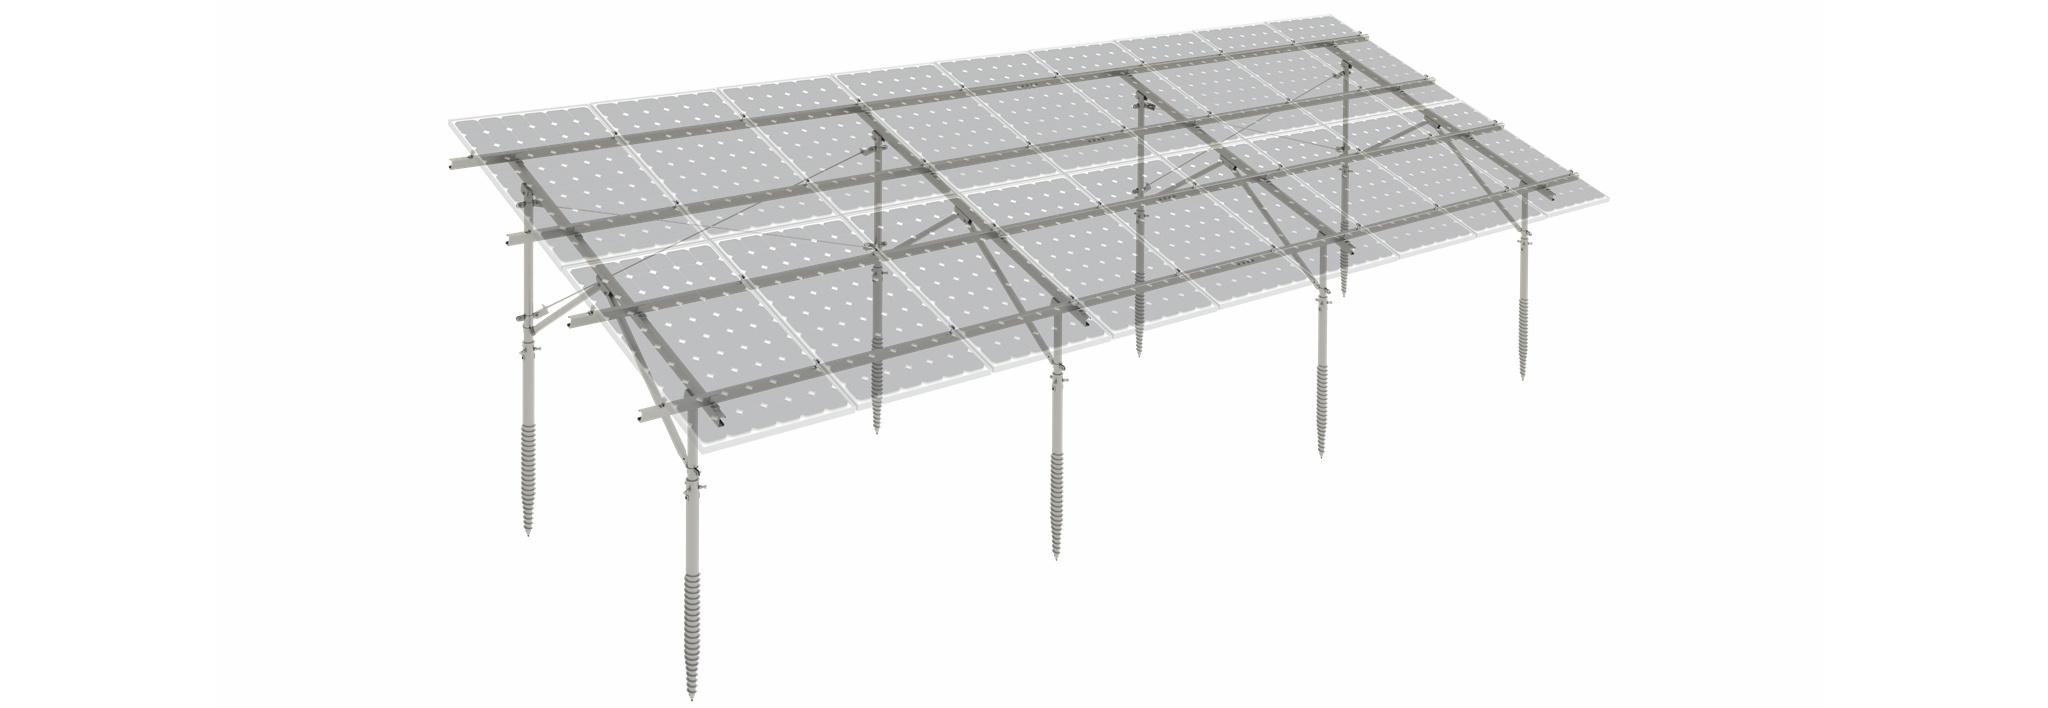 46c PV-ezRack SolarTerrace I-D with Full Panels